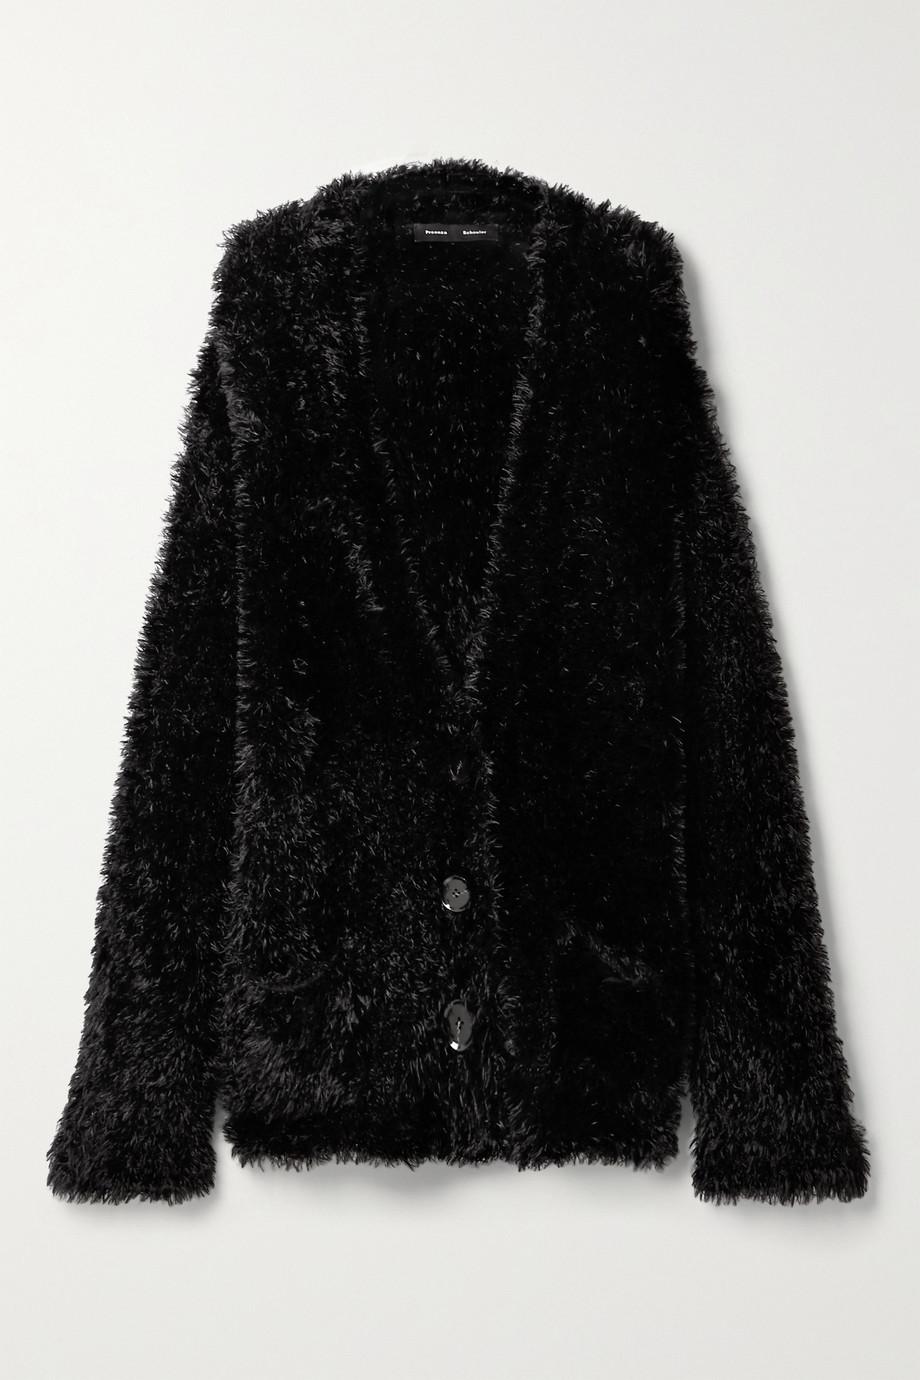 Proenza Schouler Knitted cardigan